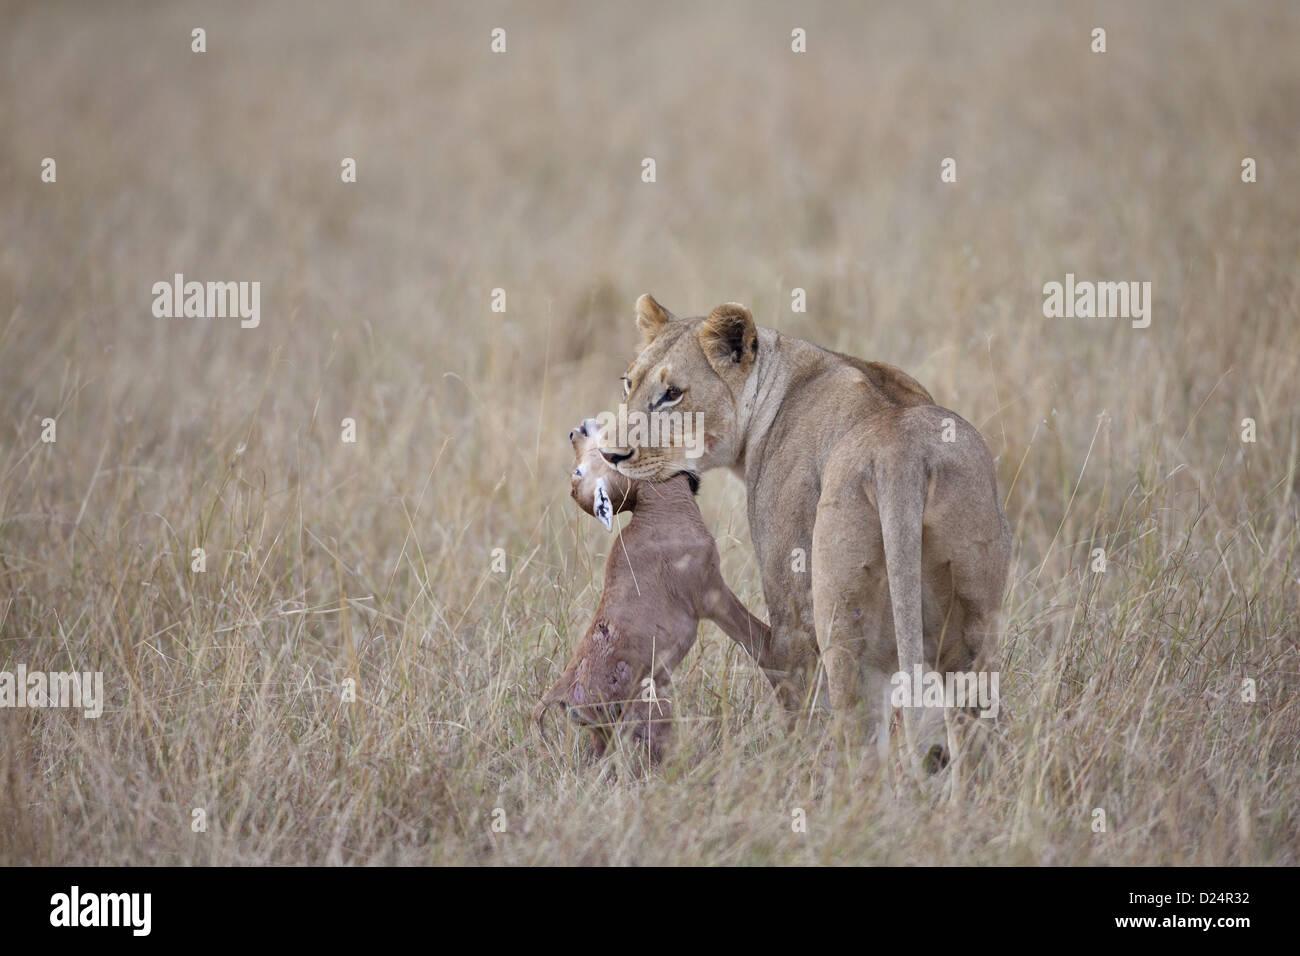 ashurnasirpal ii killing lions